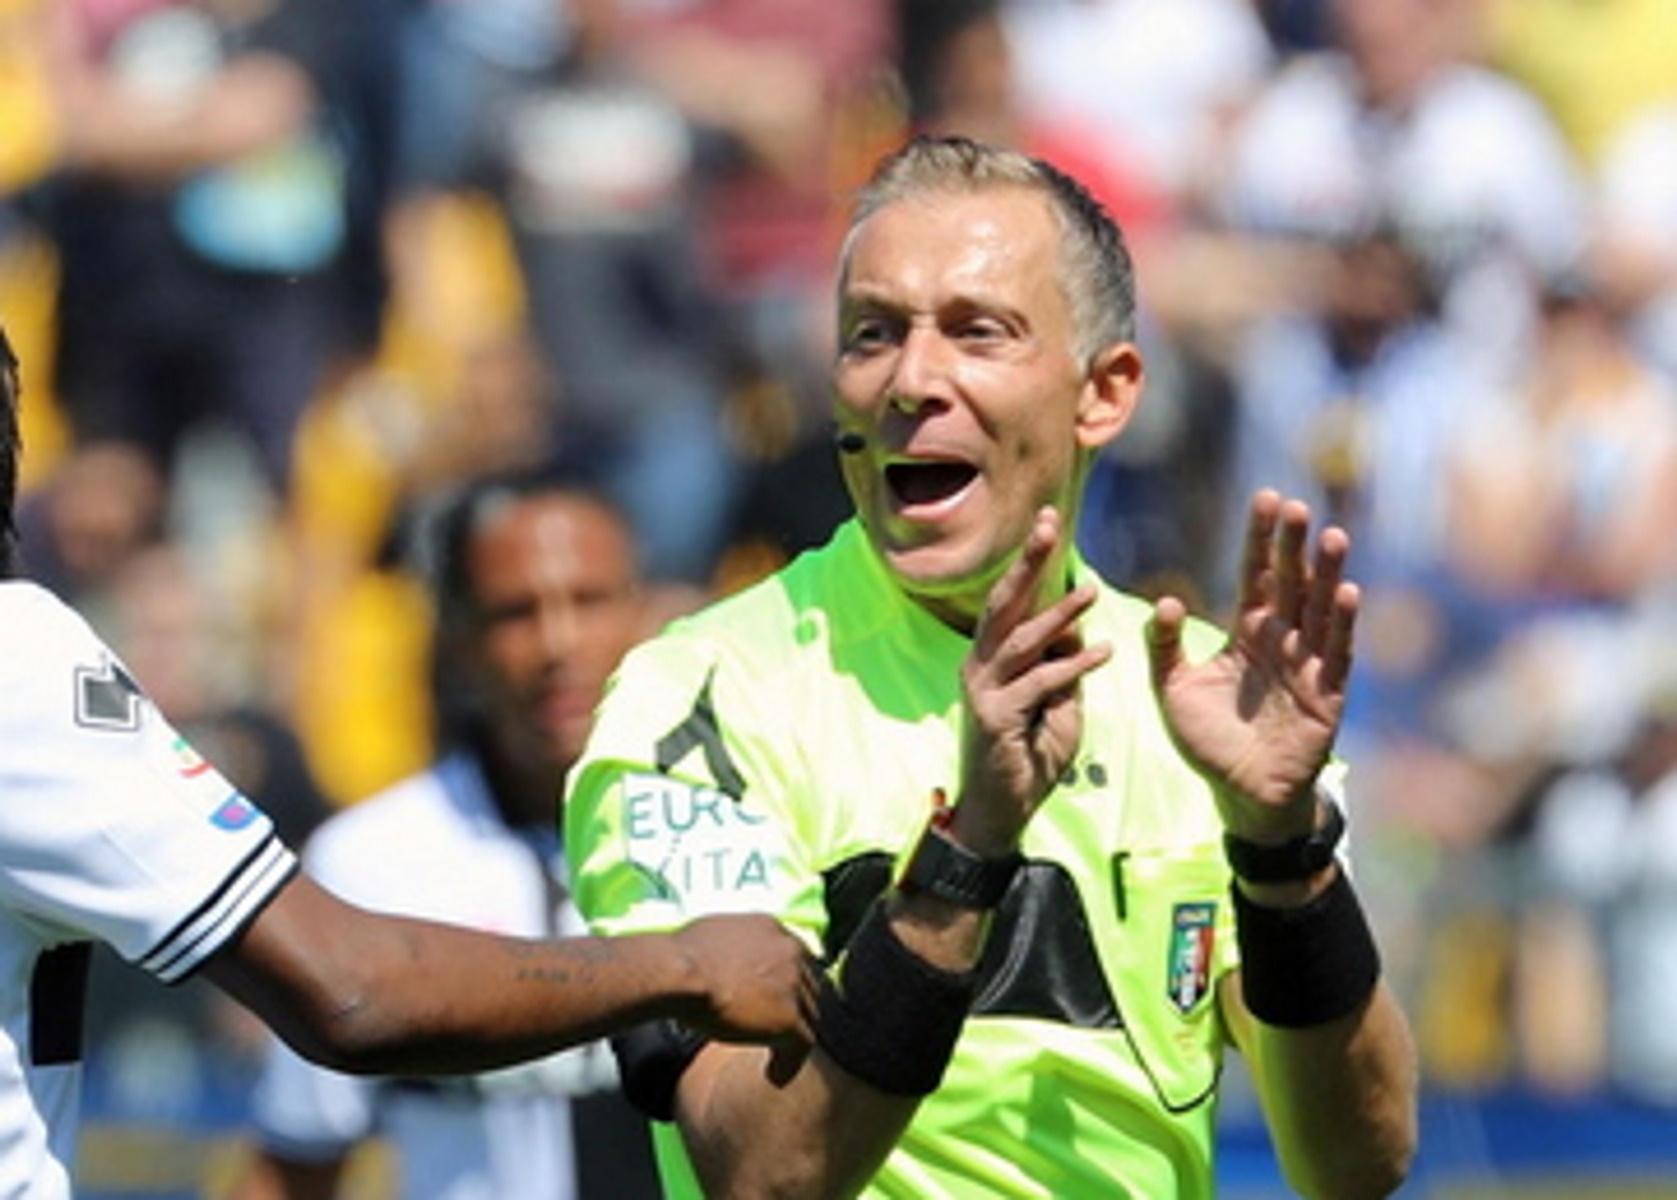 Superleague 1, ΠΑΟΚ – ΑΕΚ: Ο Ιταλός Πάολο Βαλέρι, διαιτητής στο ντέρμπι